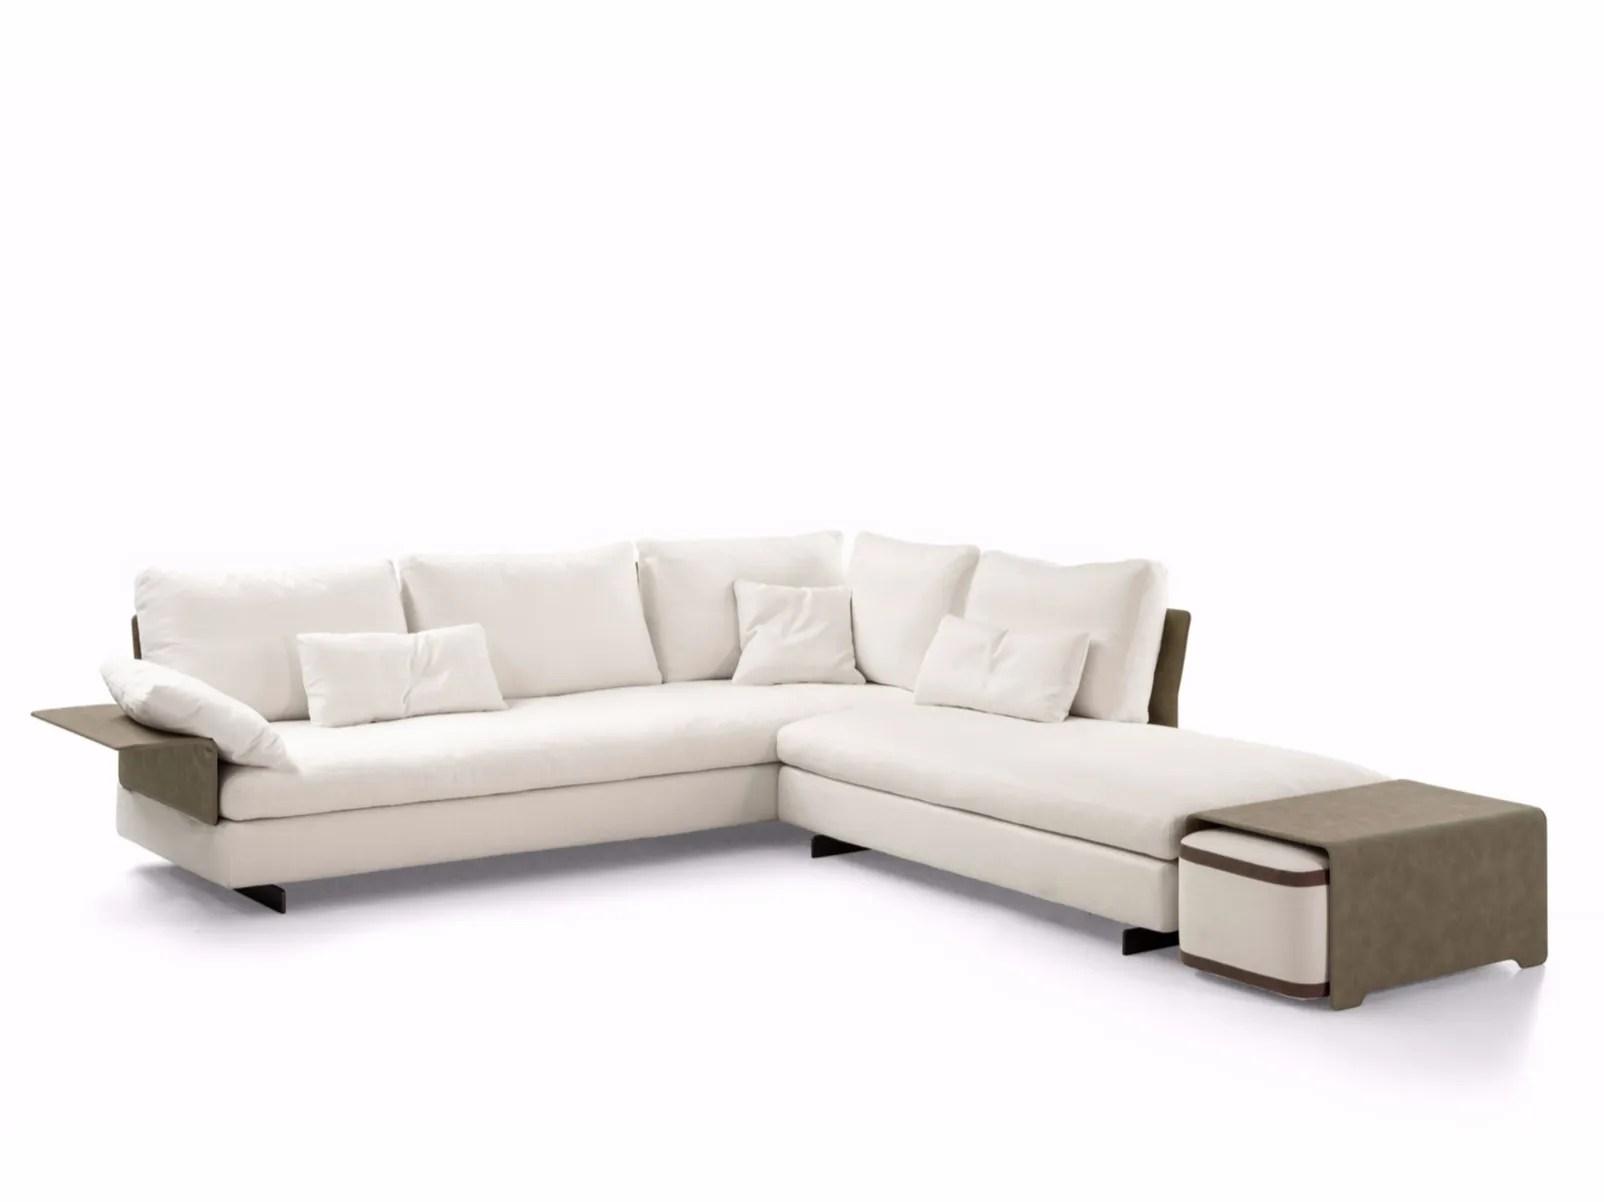 corner sofa cover design sleeper with recliner gossip by bonaldo sergio bicego